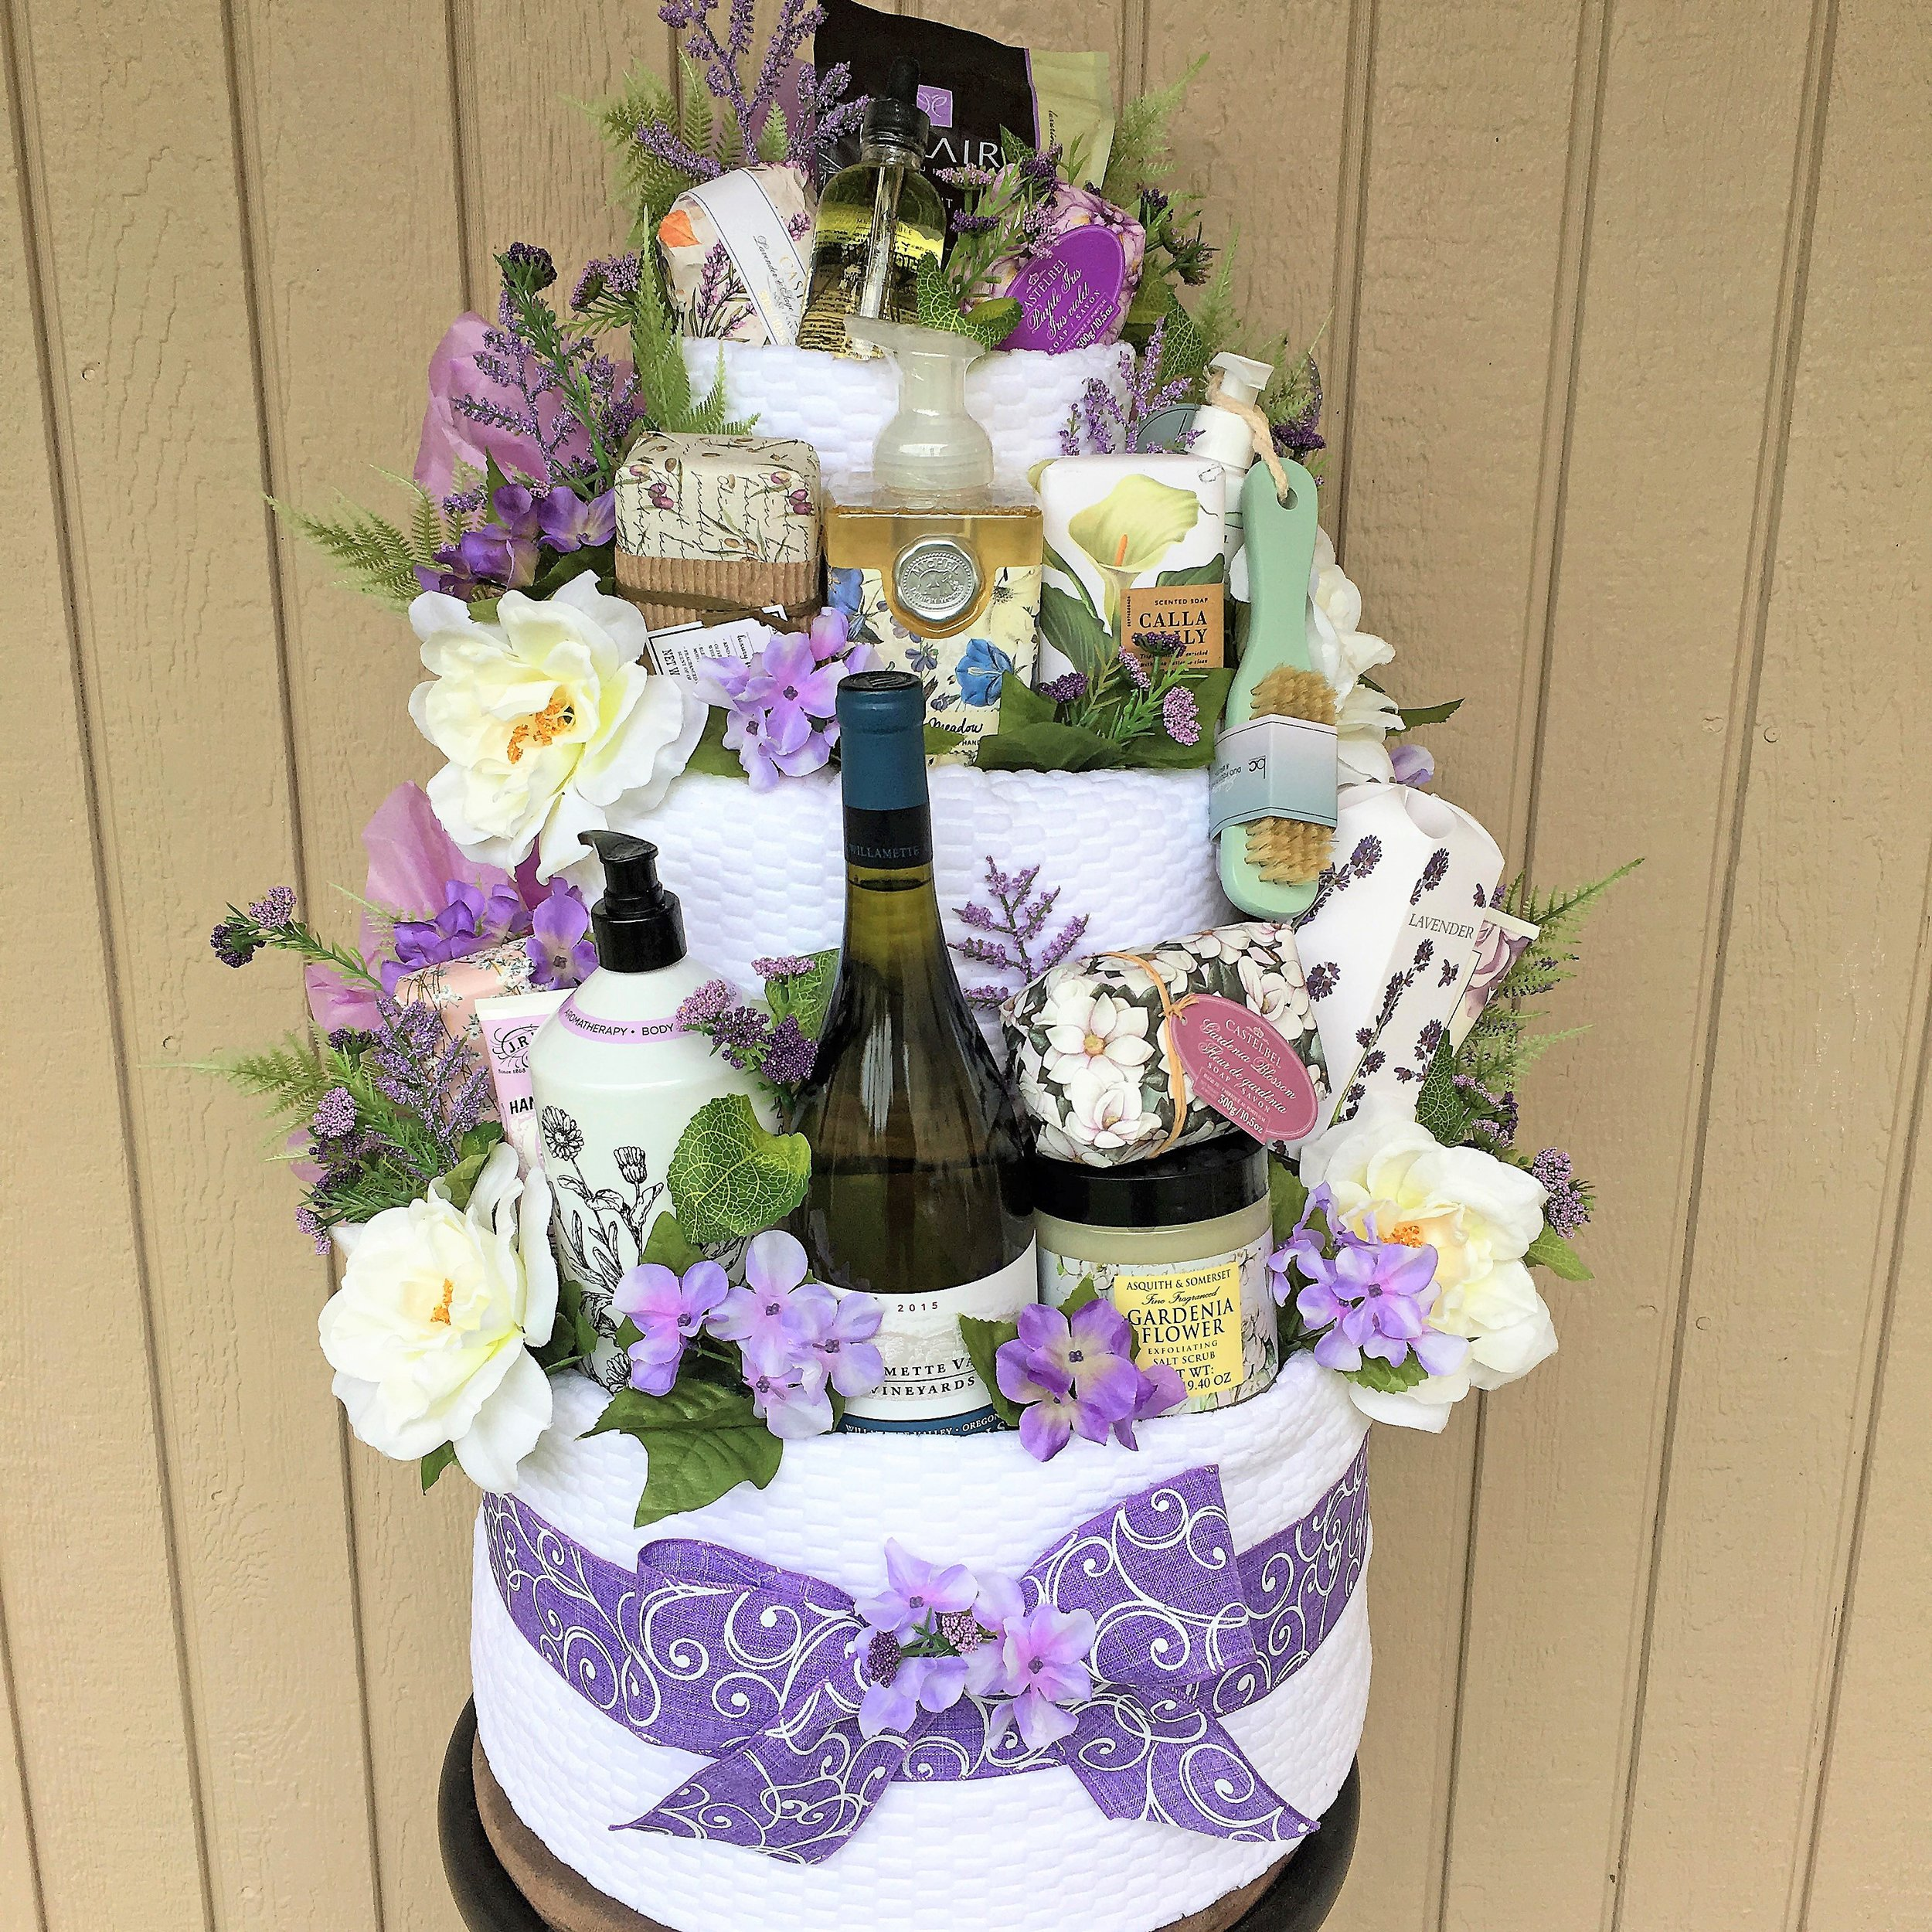 Garden Spa Cake Tower Gift Basket